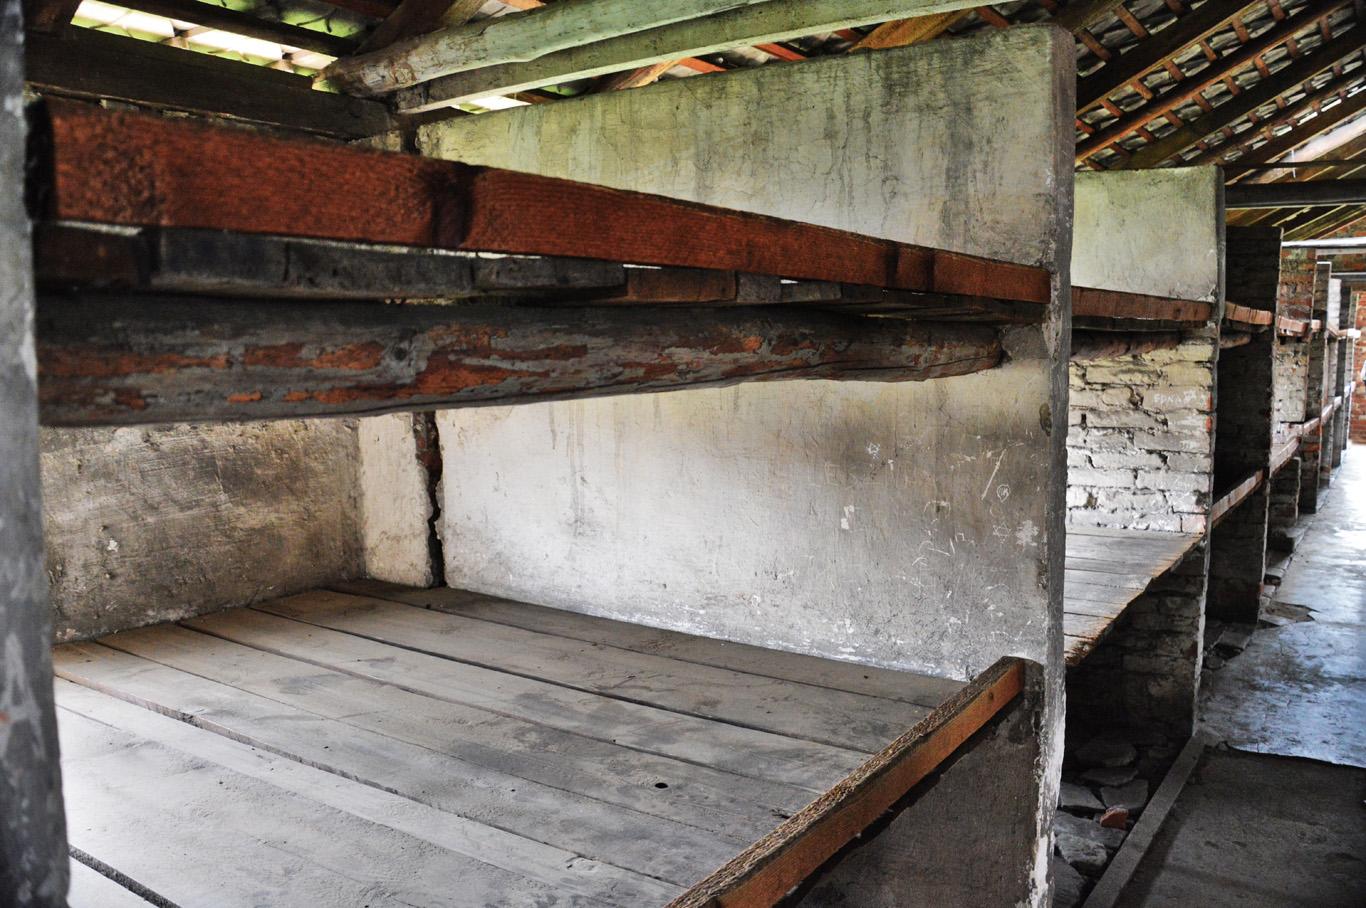 Bunk beds in Birkenau